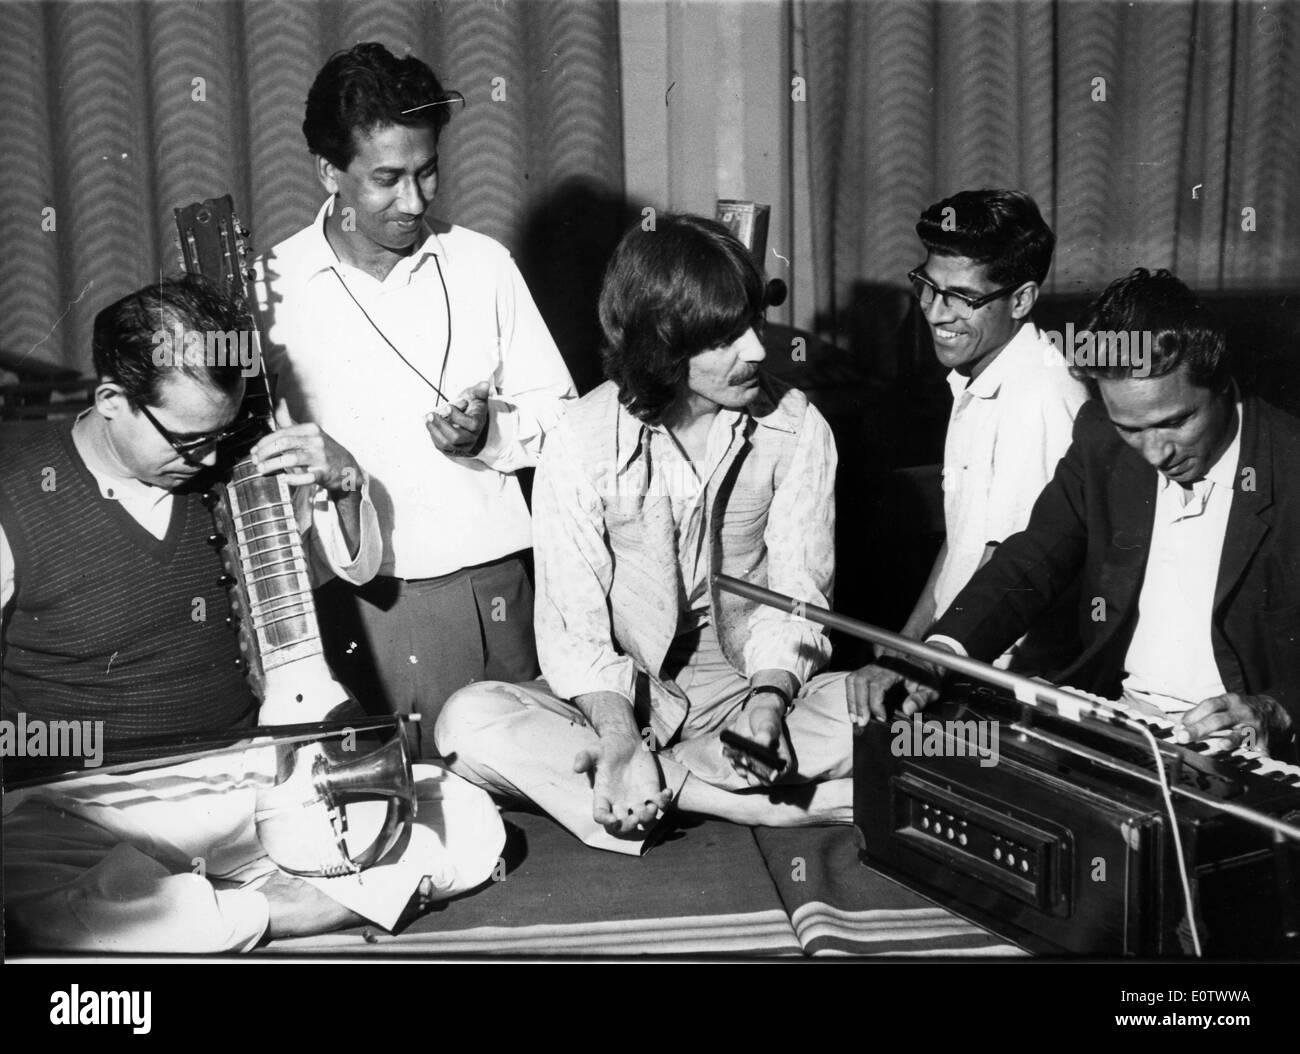 Beatle George Harrison at the recording studio - Stock Image